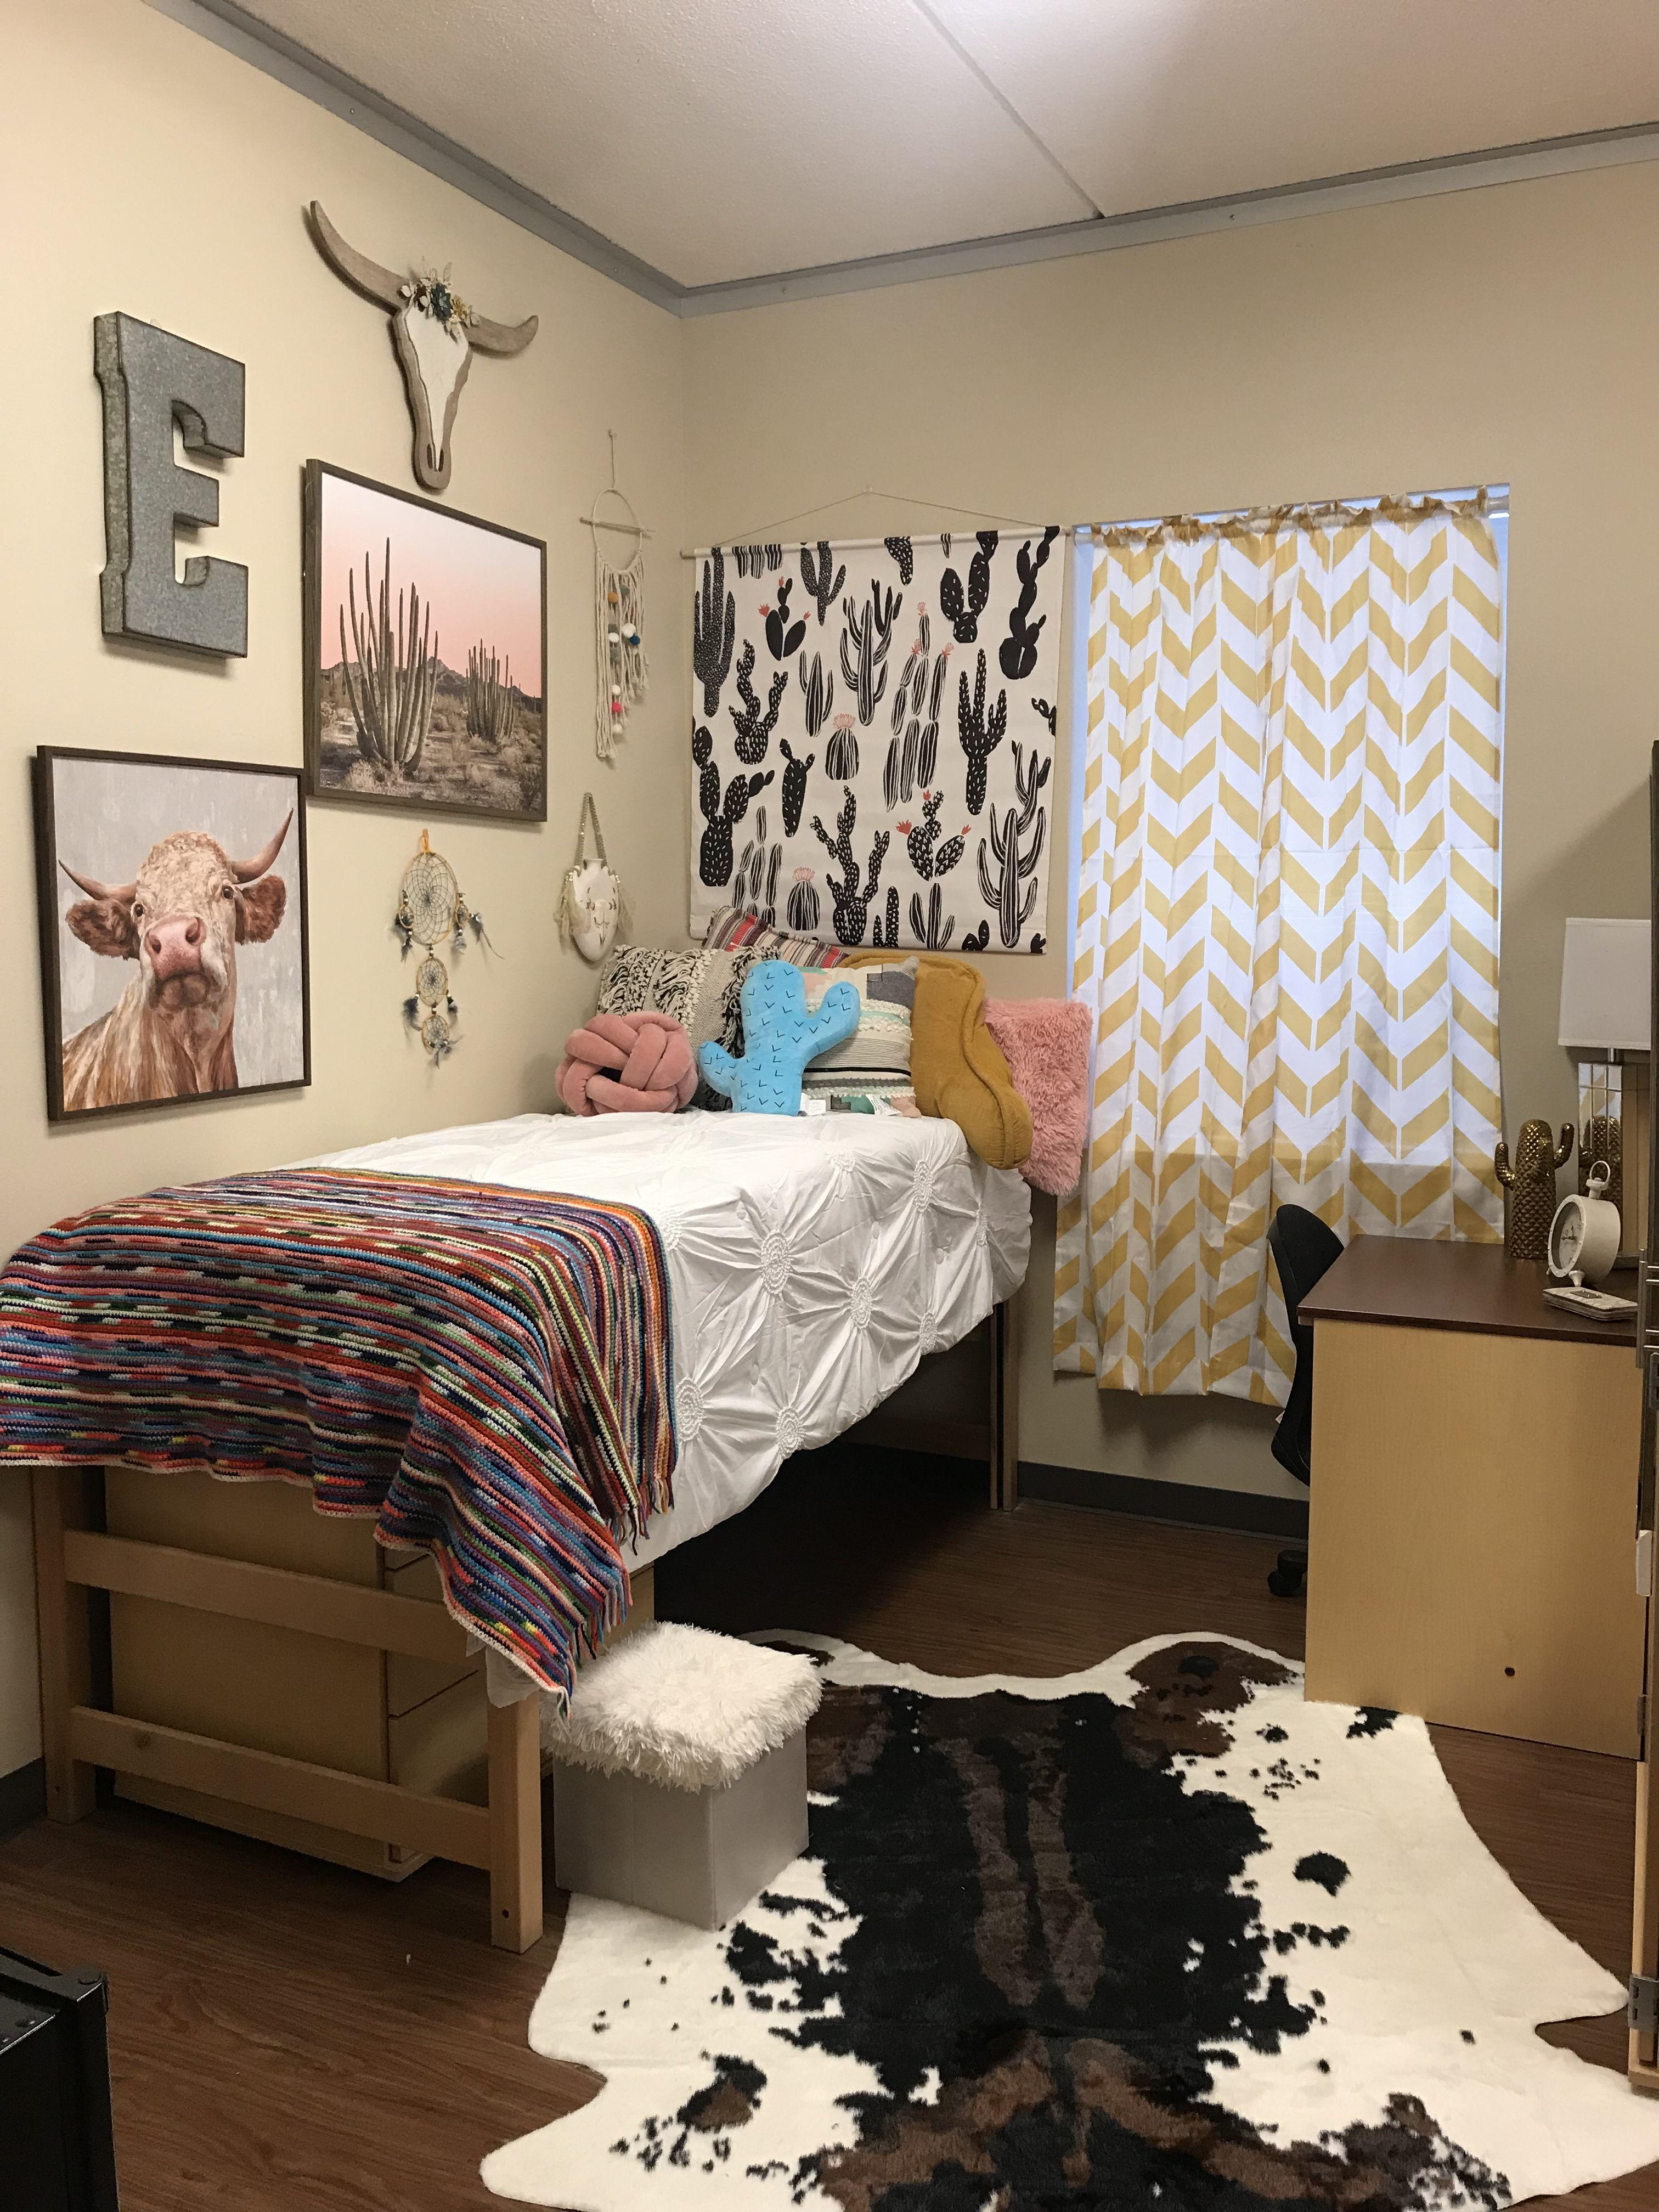 Dorm western cactus also best diy farmhouse room design ideas harley pinterest rh